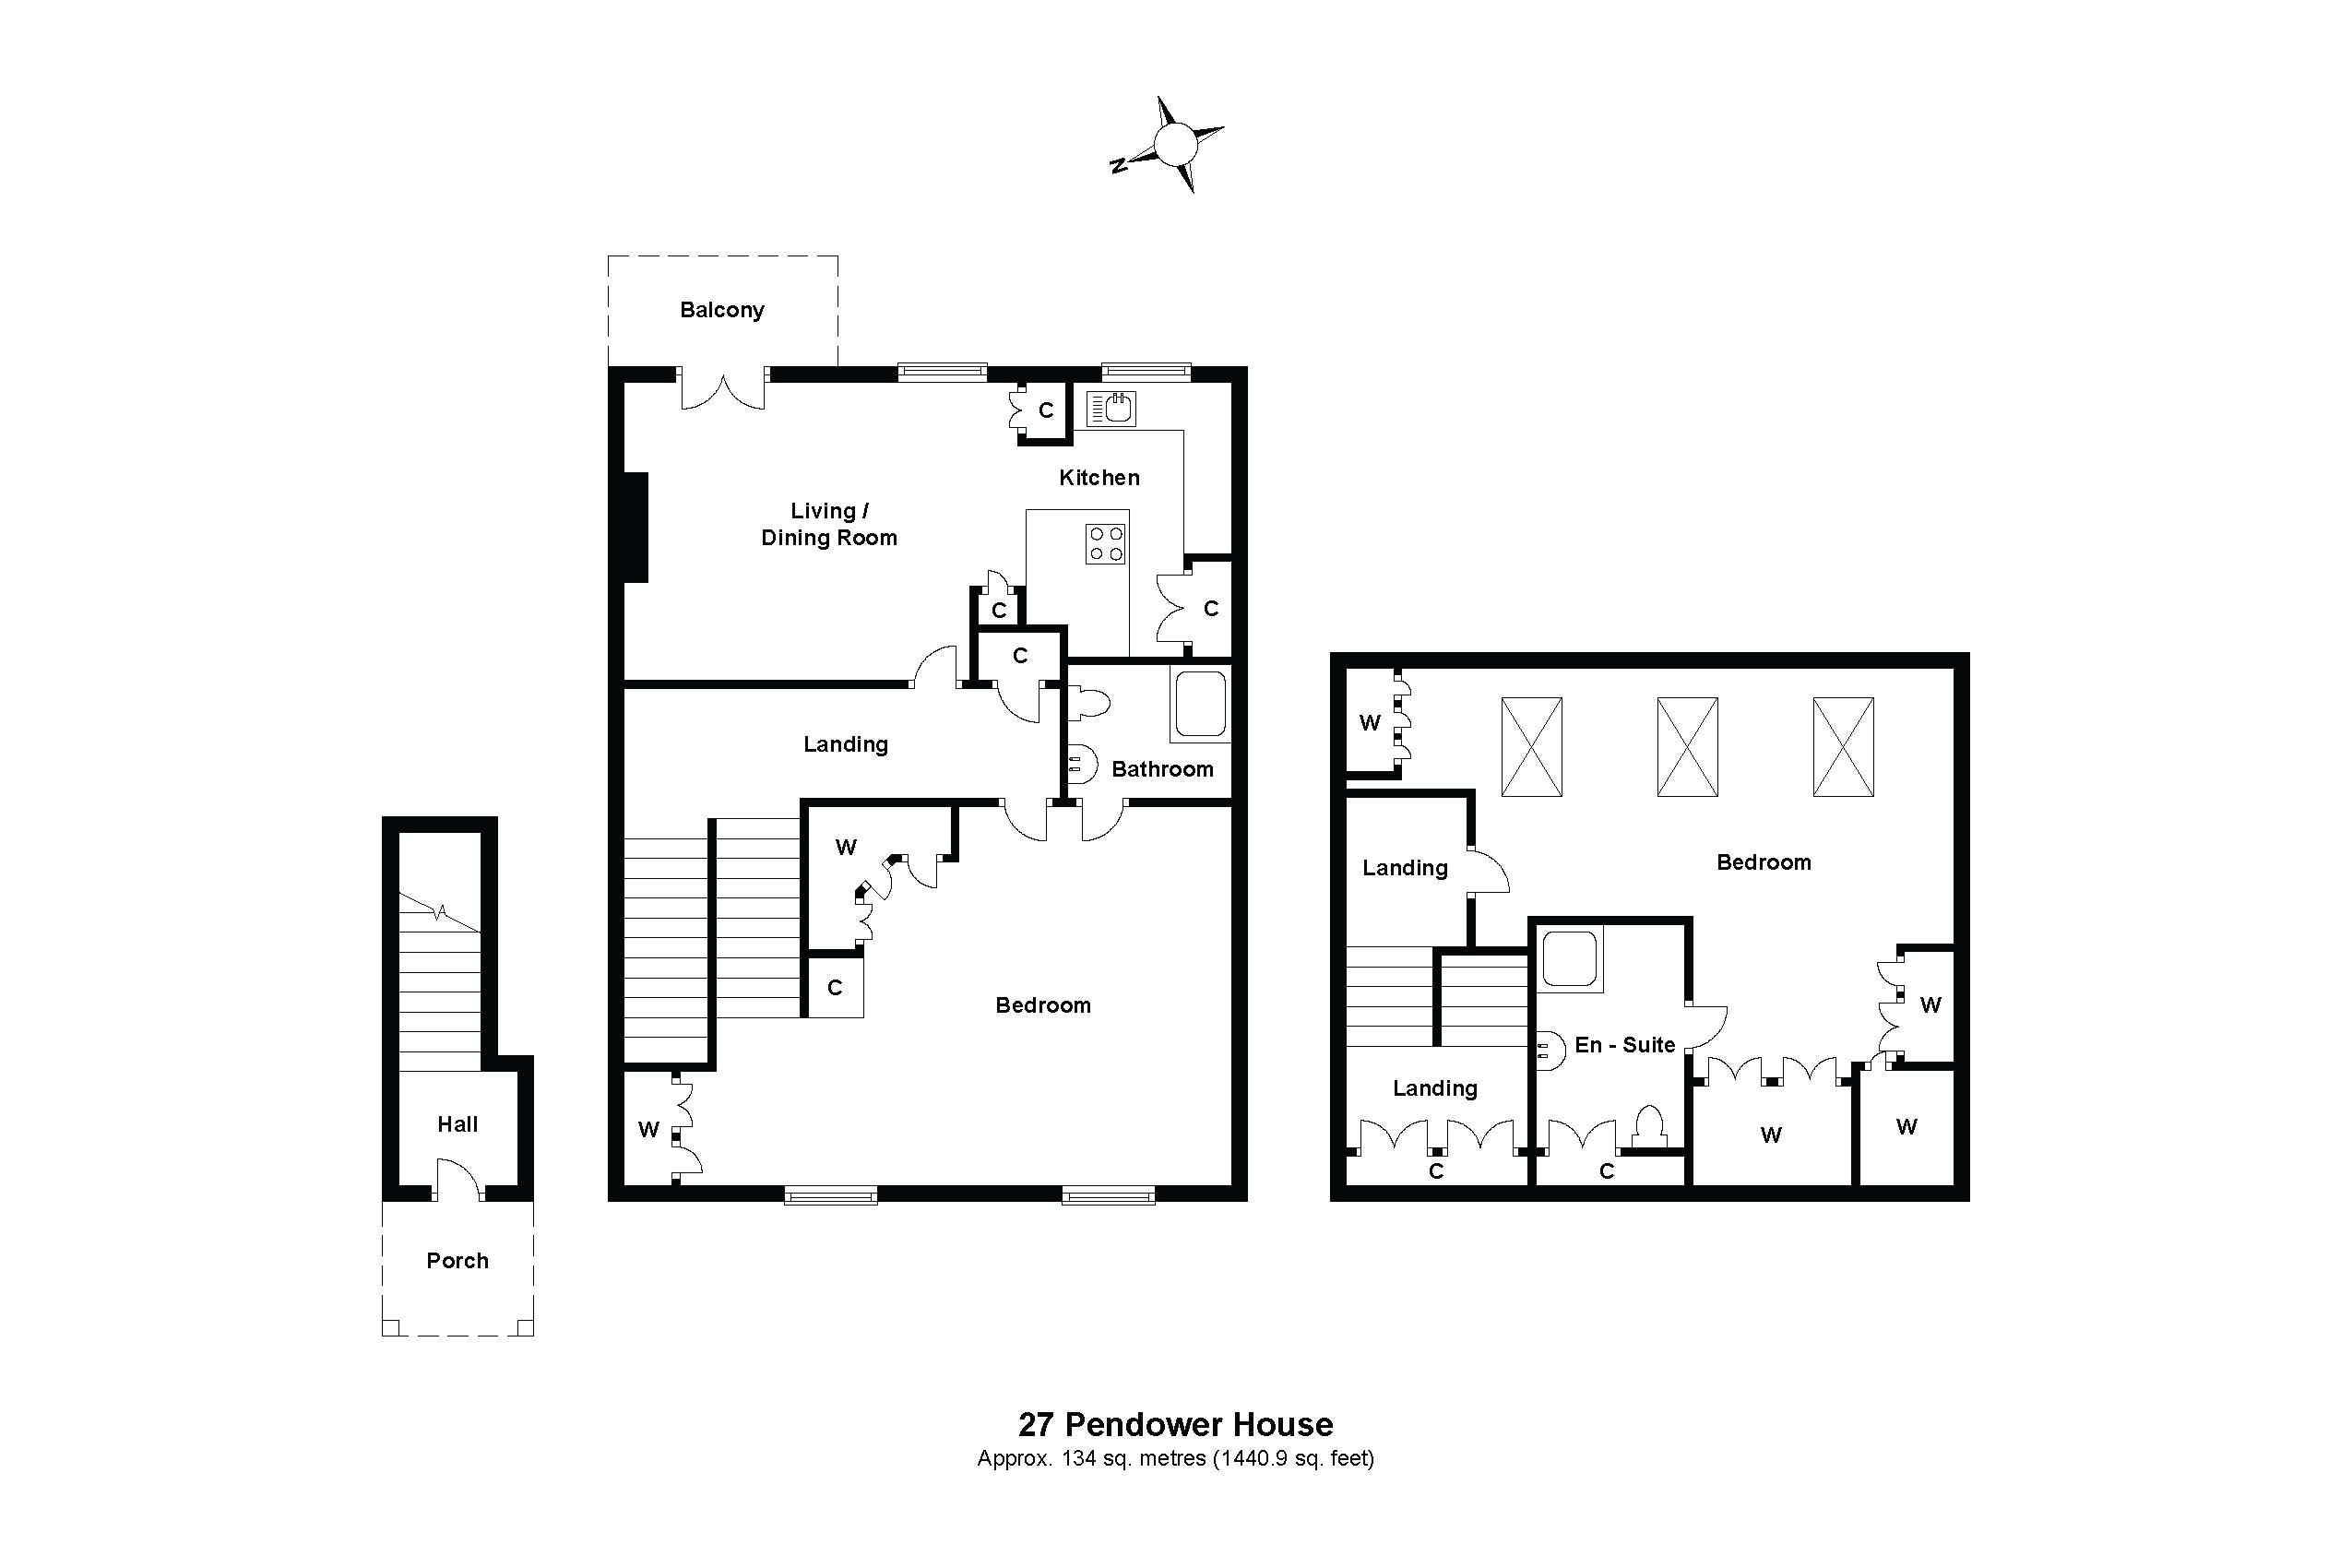 27 Pendower House Floorplan